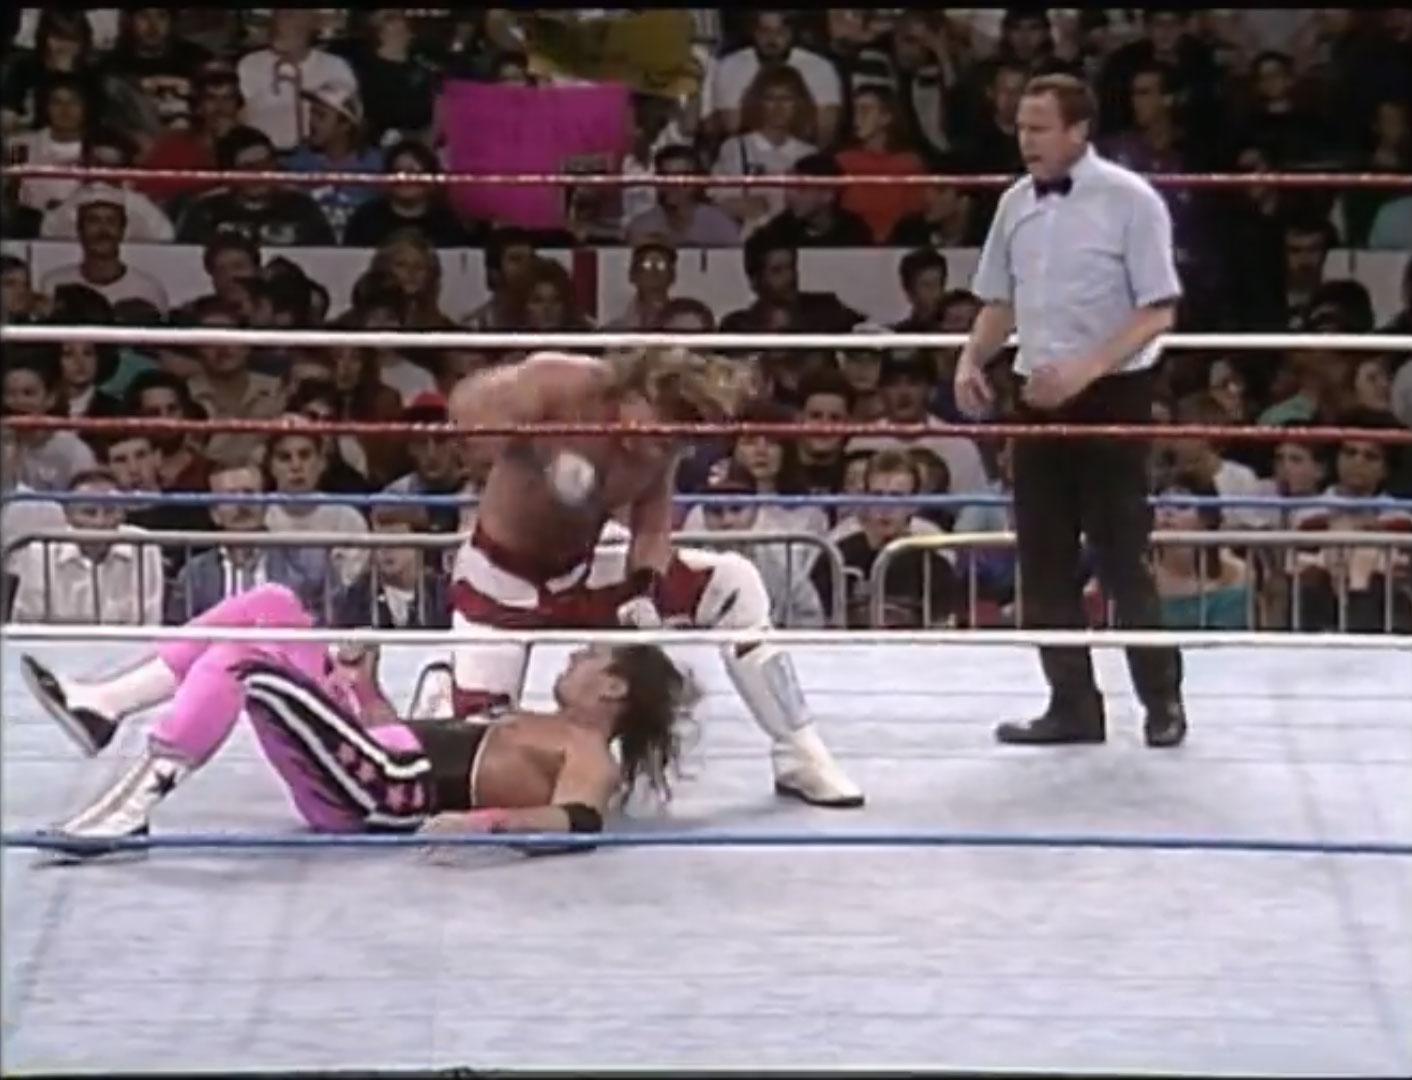 Bret Hart vs. Shawn Michaels WWF World Heavyweight Championship WWF Survivor Series '92, Nov 25th 1992